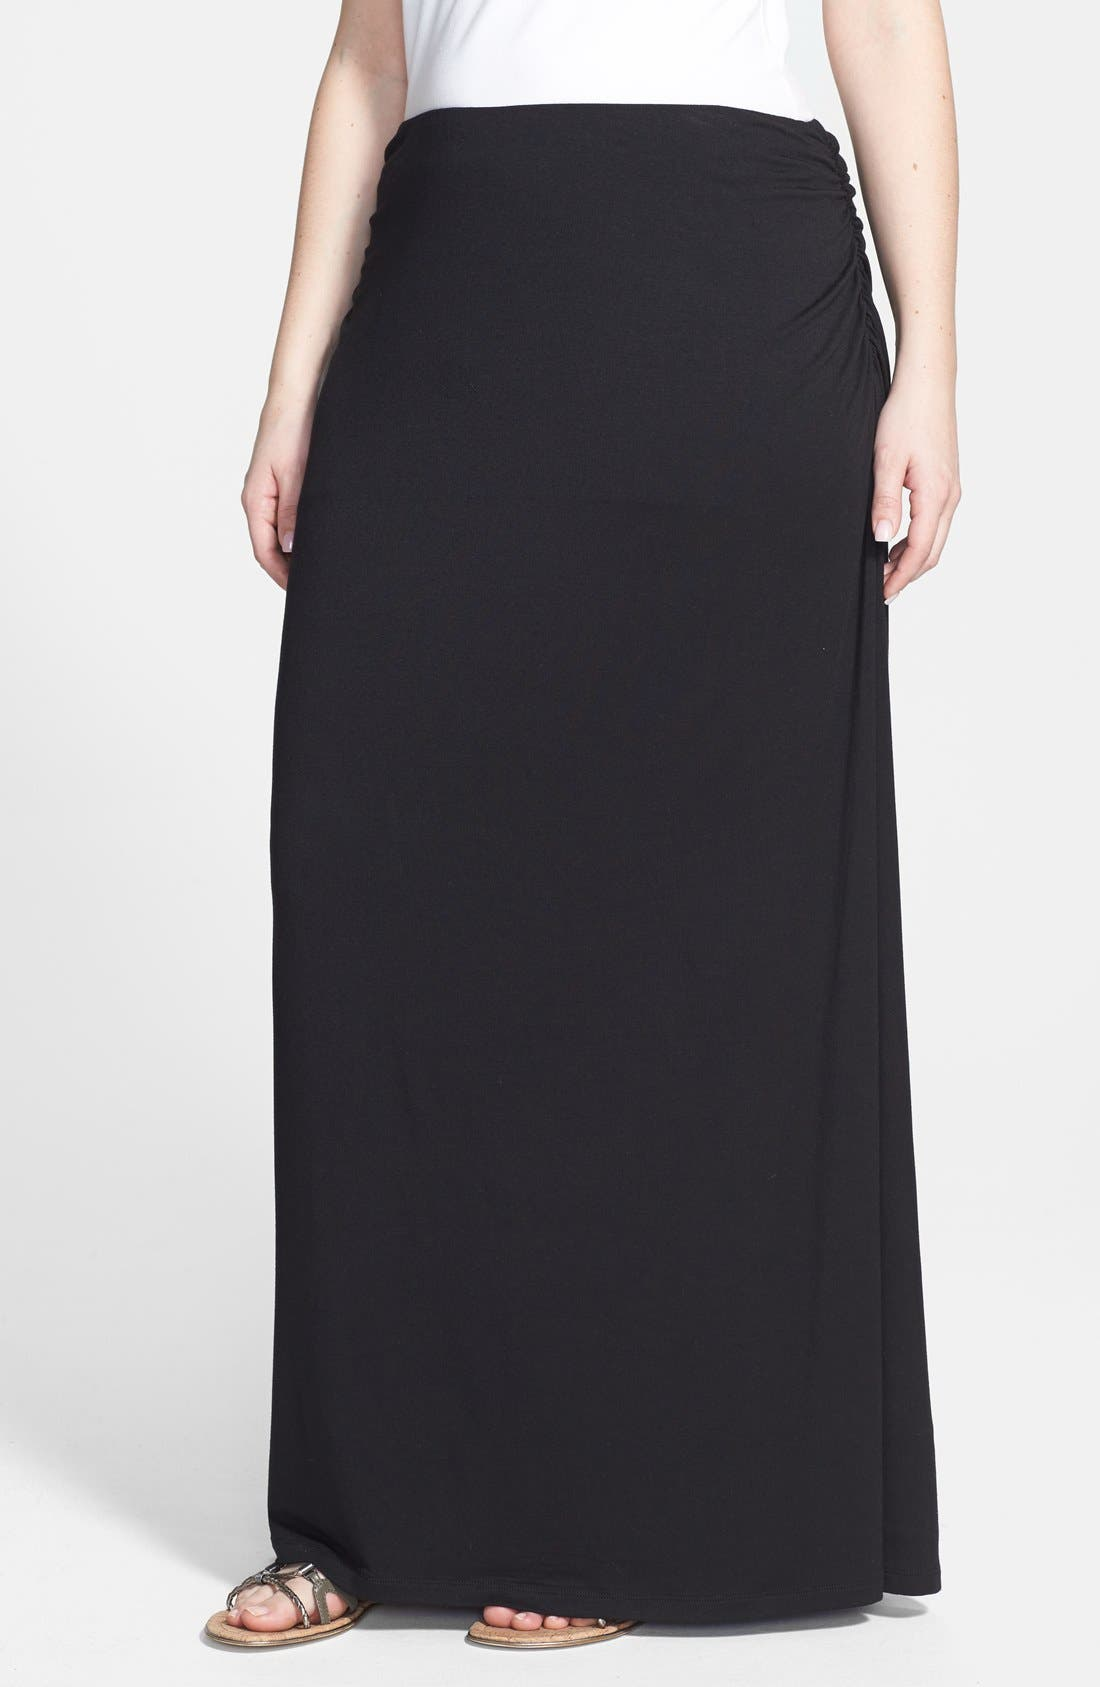 Alternate Image 1 Selected - Caslon® Convertible Maxi Skirt (Plus Size)